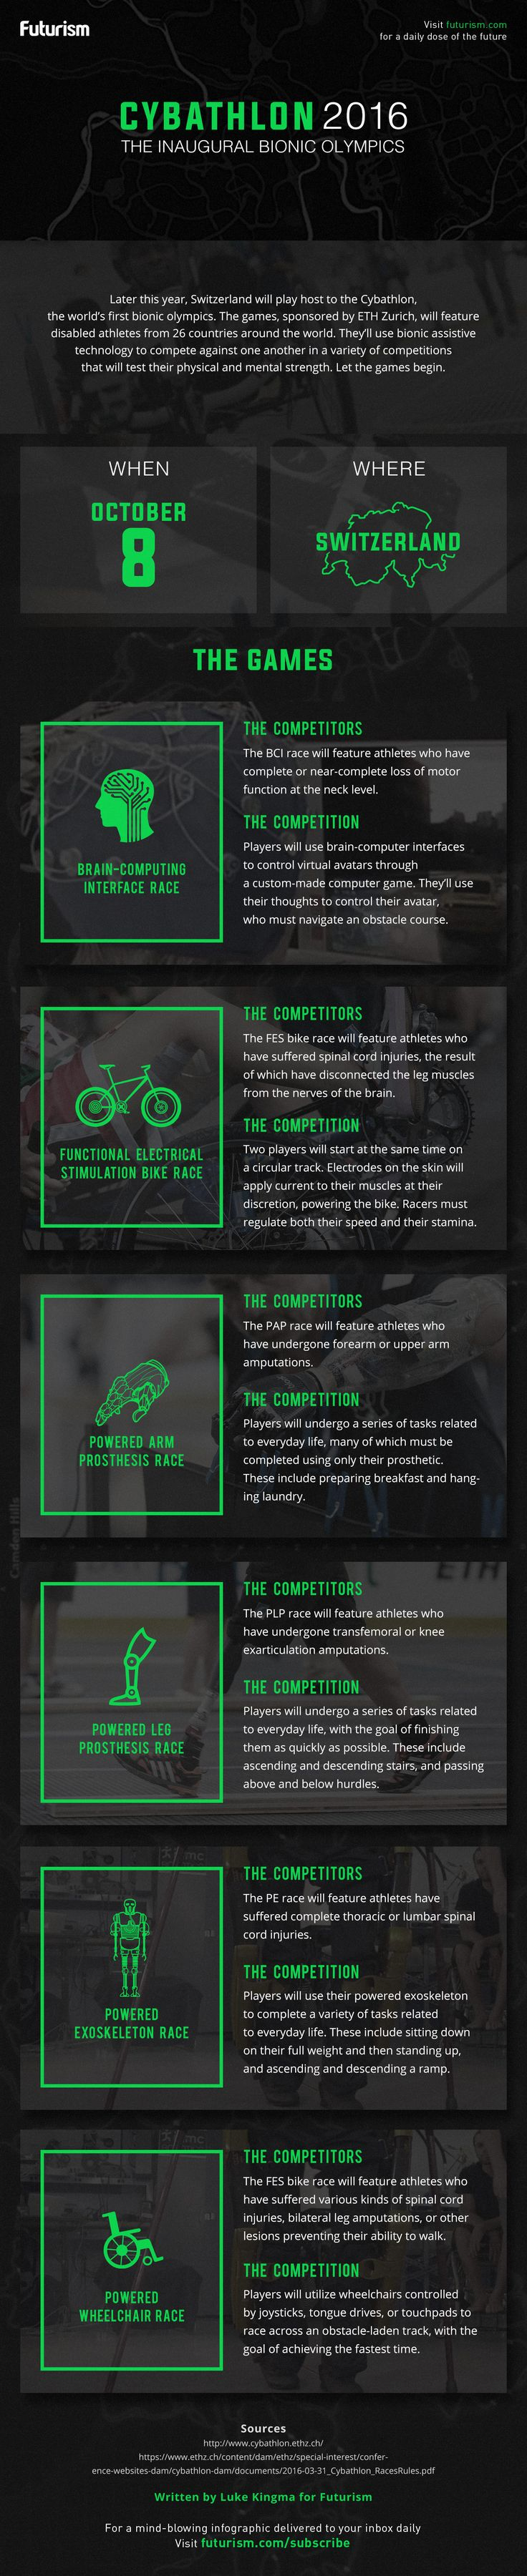 """Cybathlon 2016: The Inaugural Bionic Olympics"" #transhumanism #cyborgs"